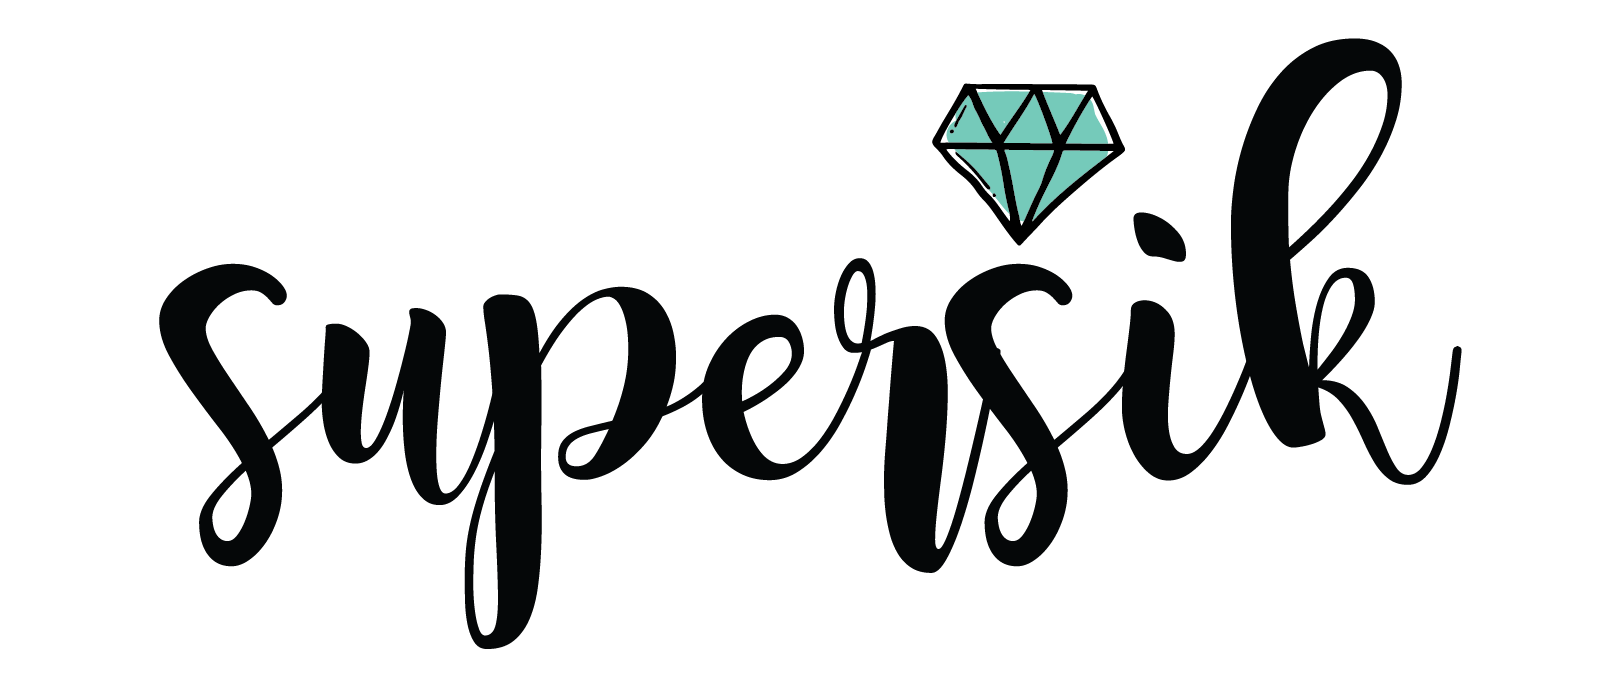 supersik.si - Personalizirane grafike